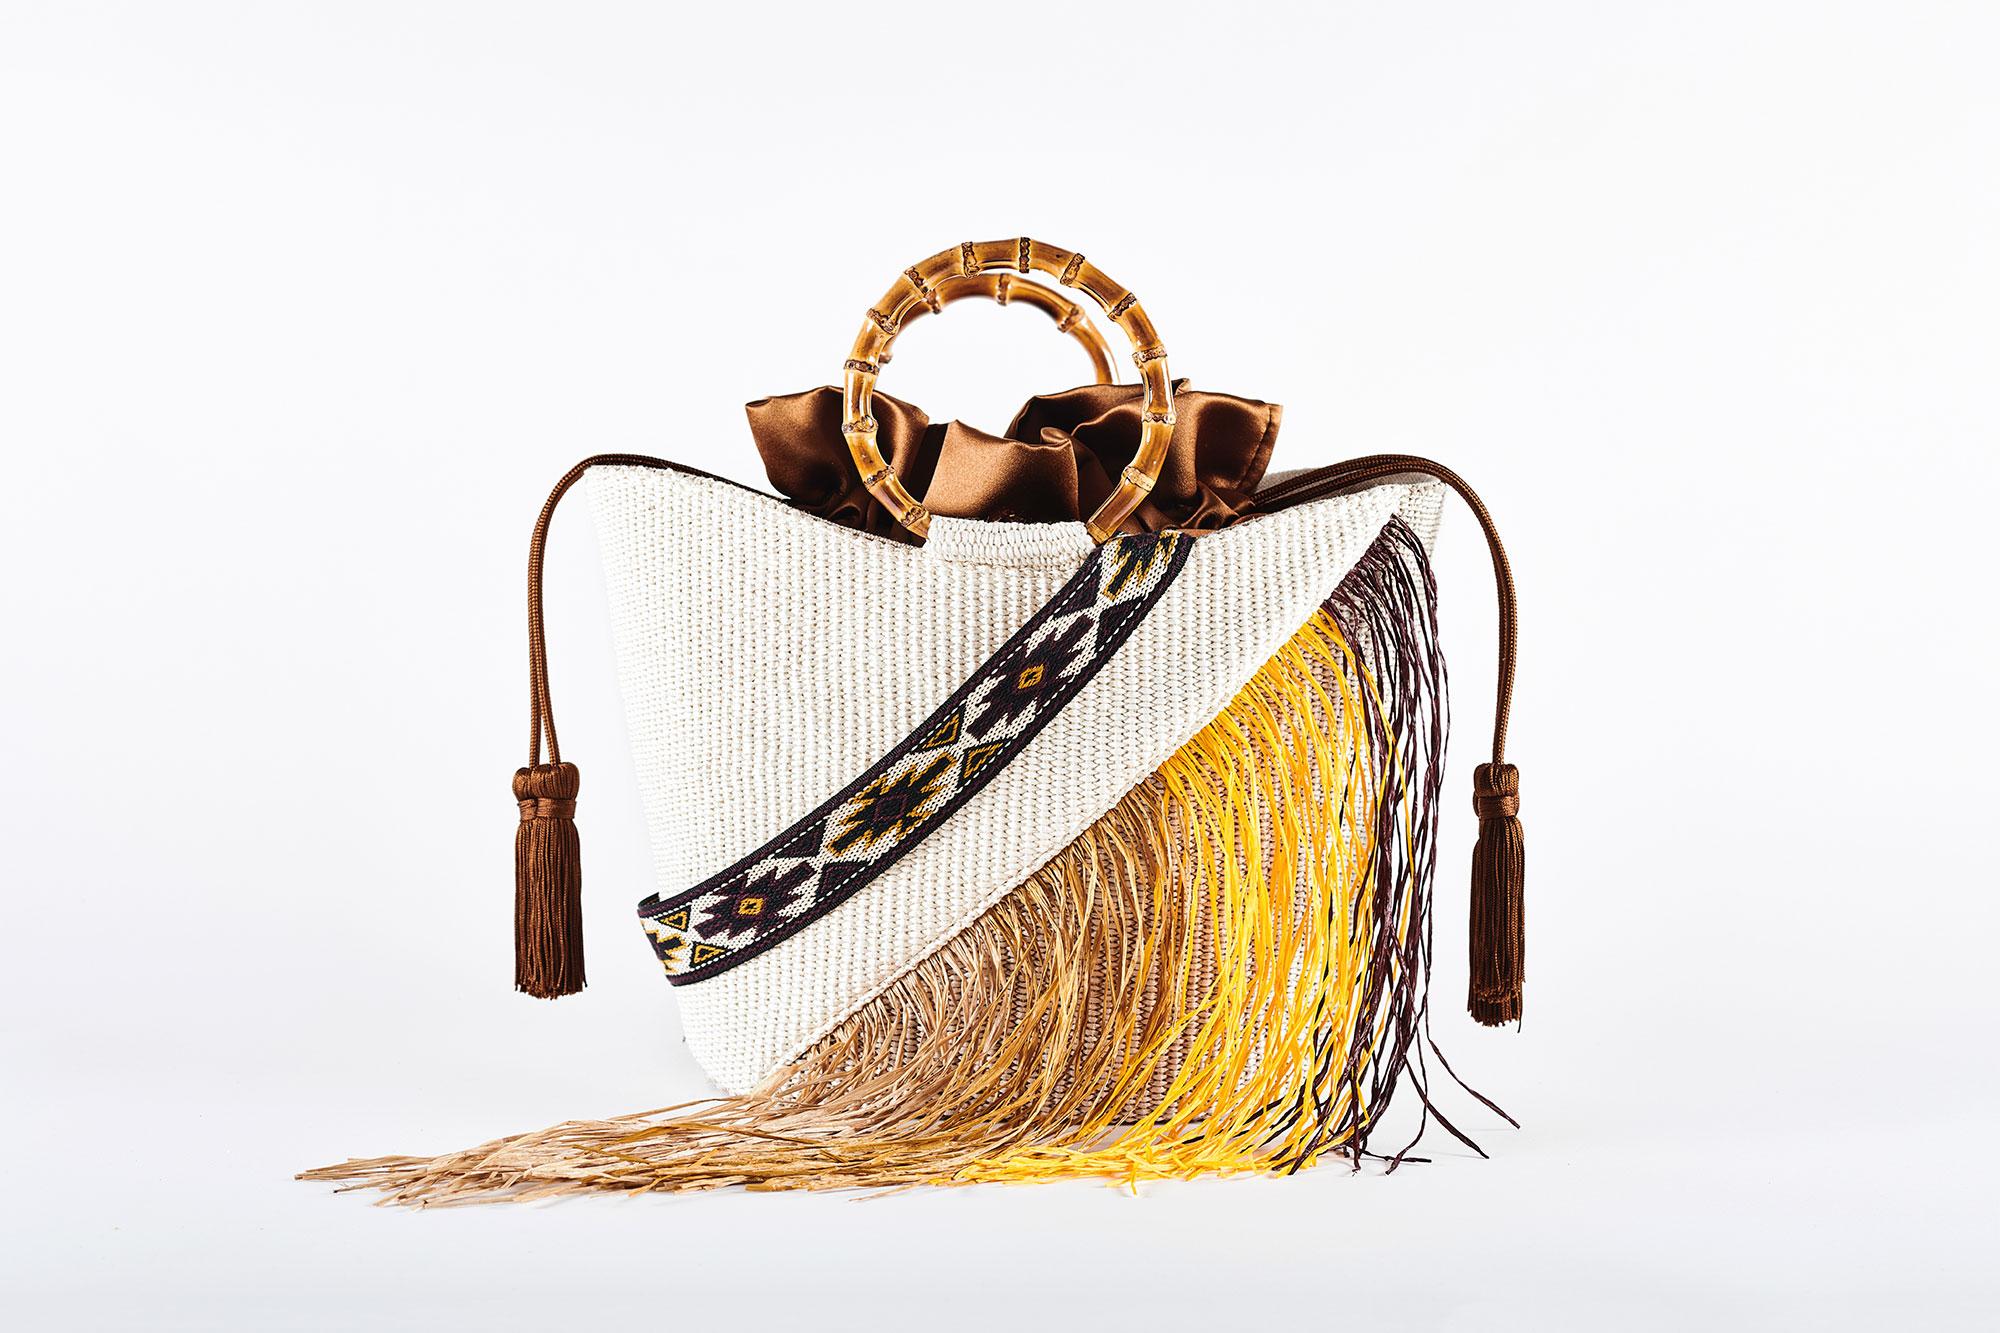 viamailbag-tahiti-fringe-a03